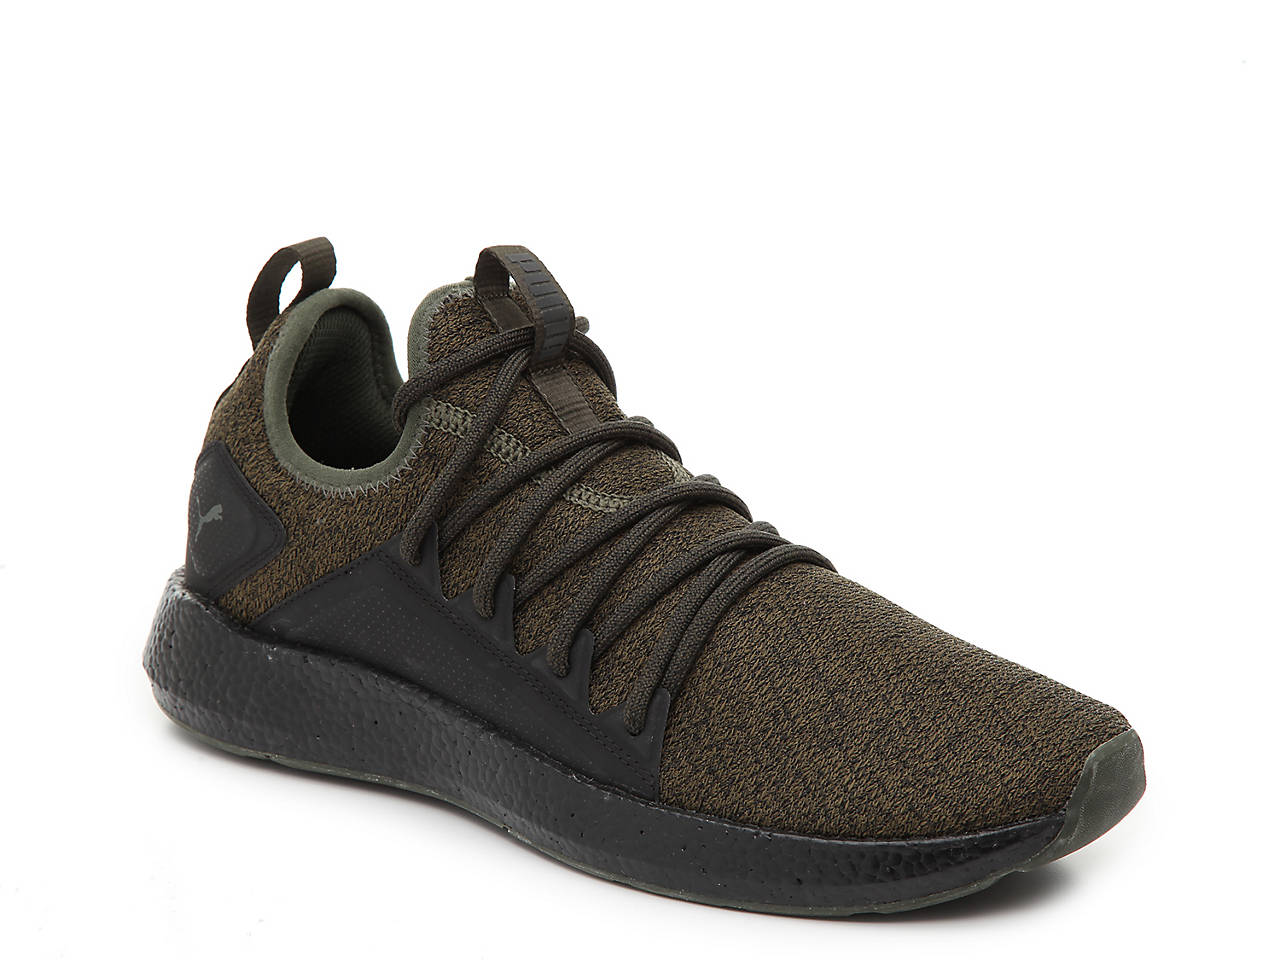 5a2c0f14b Puma Nrgy Neko Knit Sneaker - Men's Men's Shoes | DSW